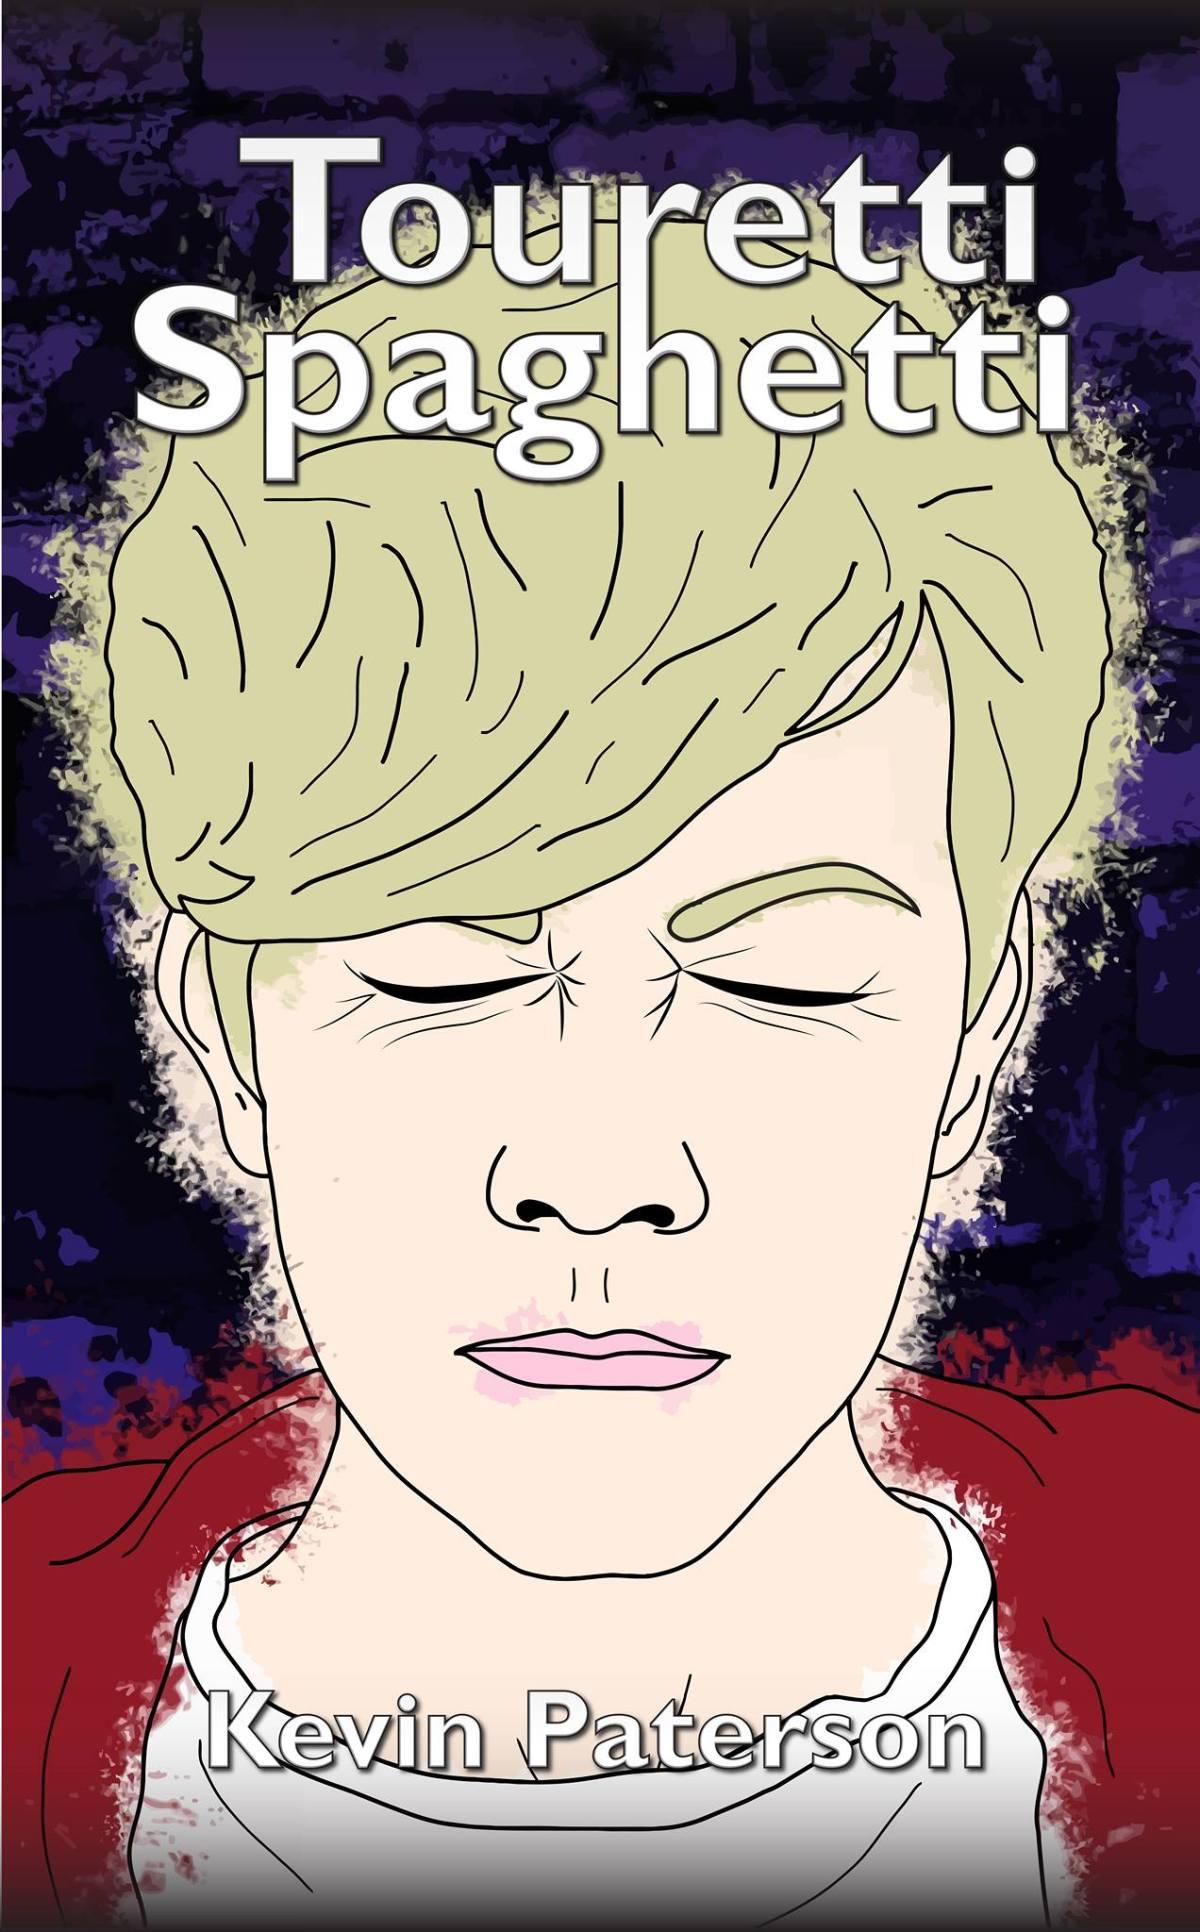 Touretti Spaghetti